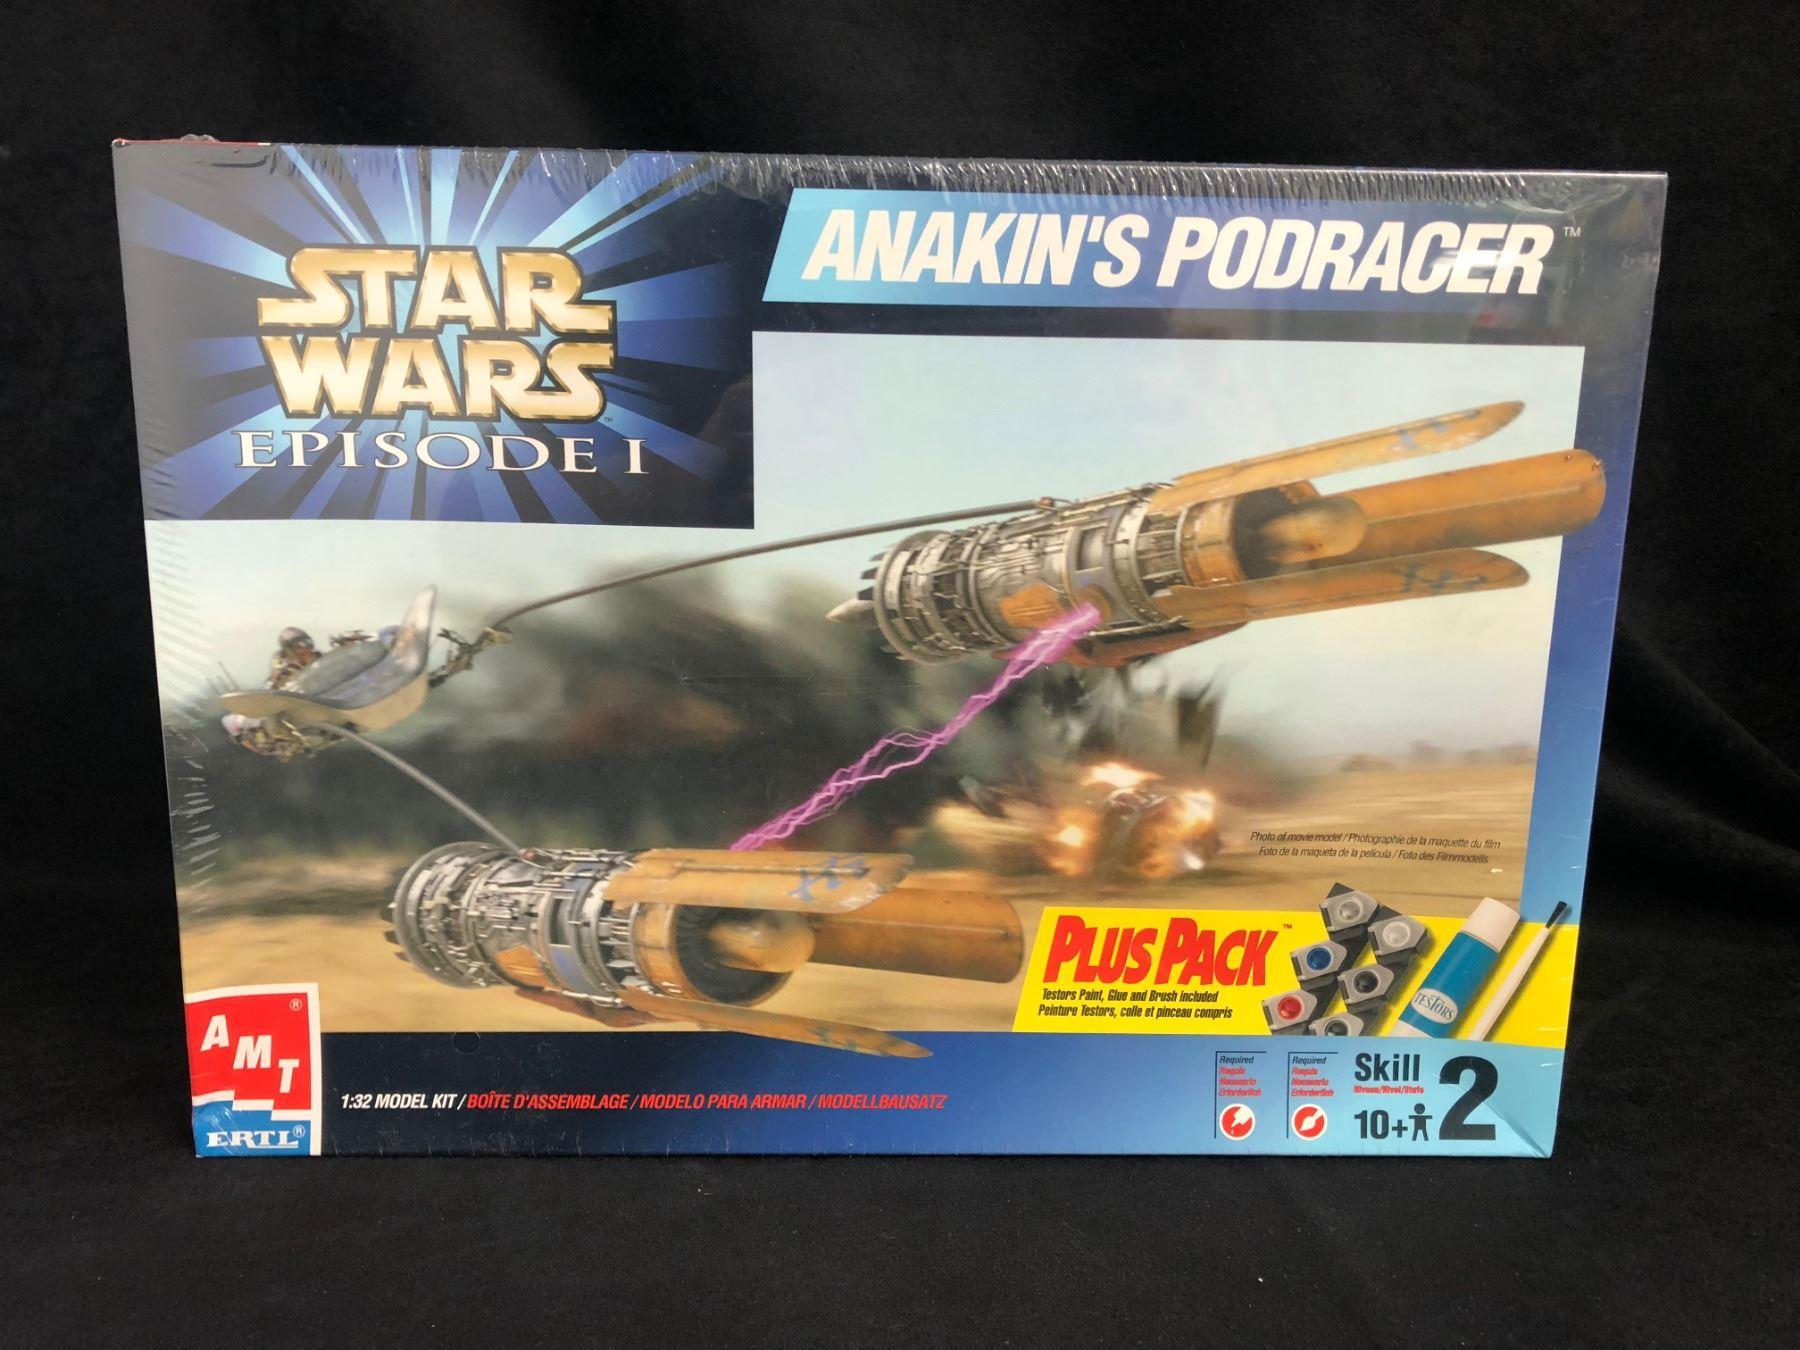 AMT Star Wars Anakin's Podracer 1/32 Plastic Model Kit (1999)